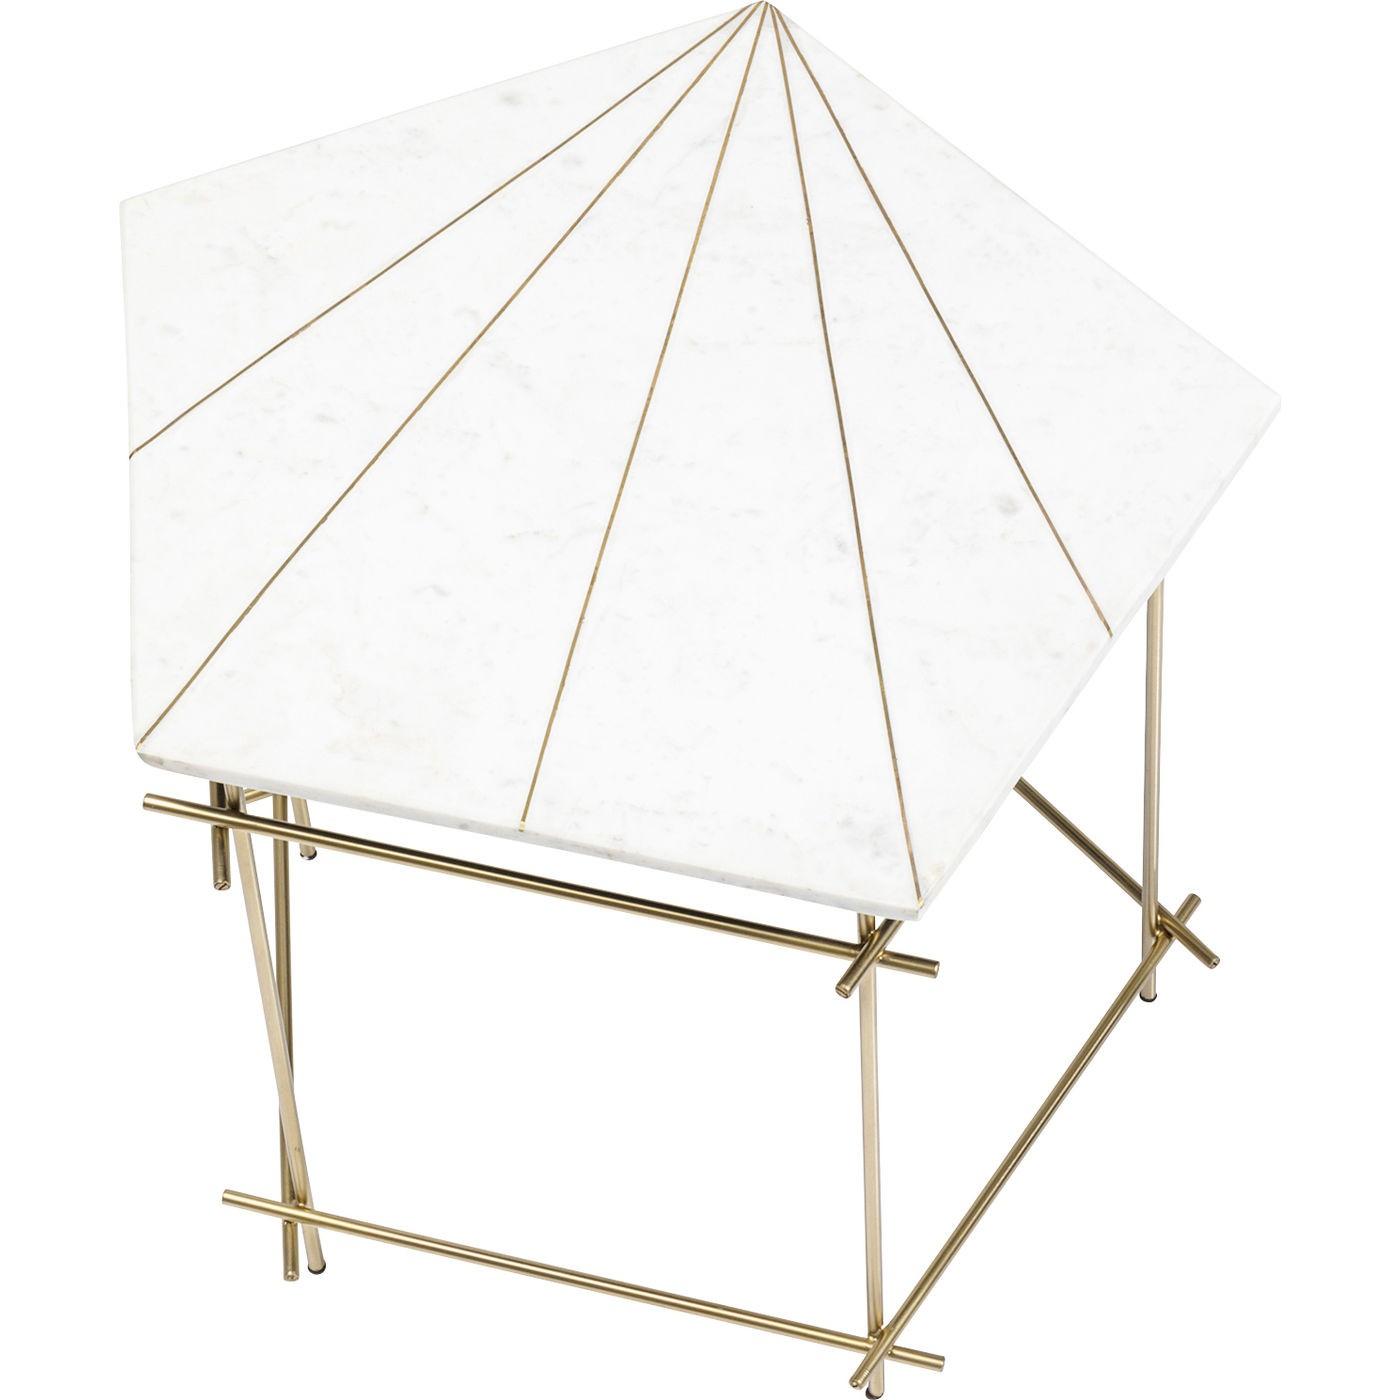 Table d'appoint Mystic Pentagon blanche 52cm Kare Design